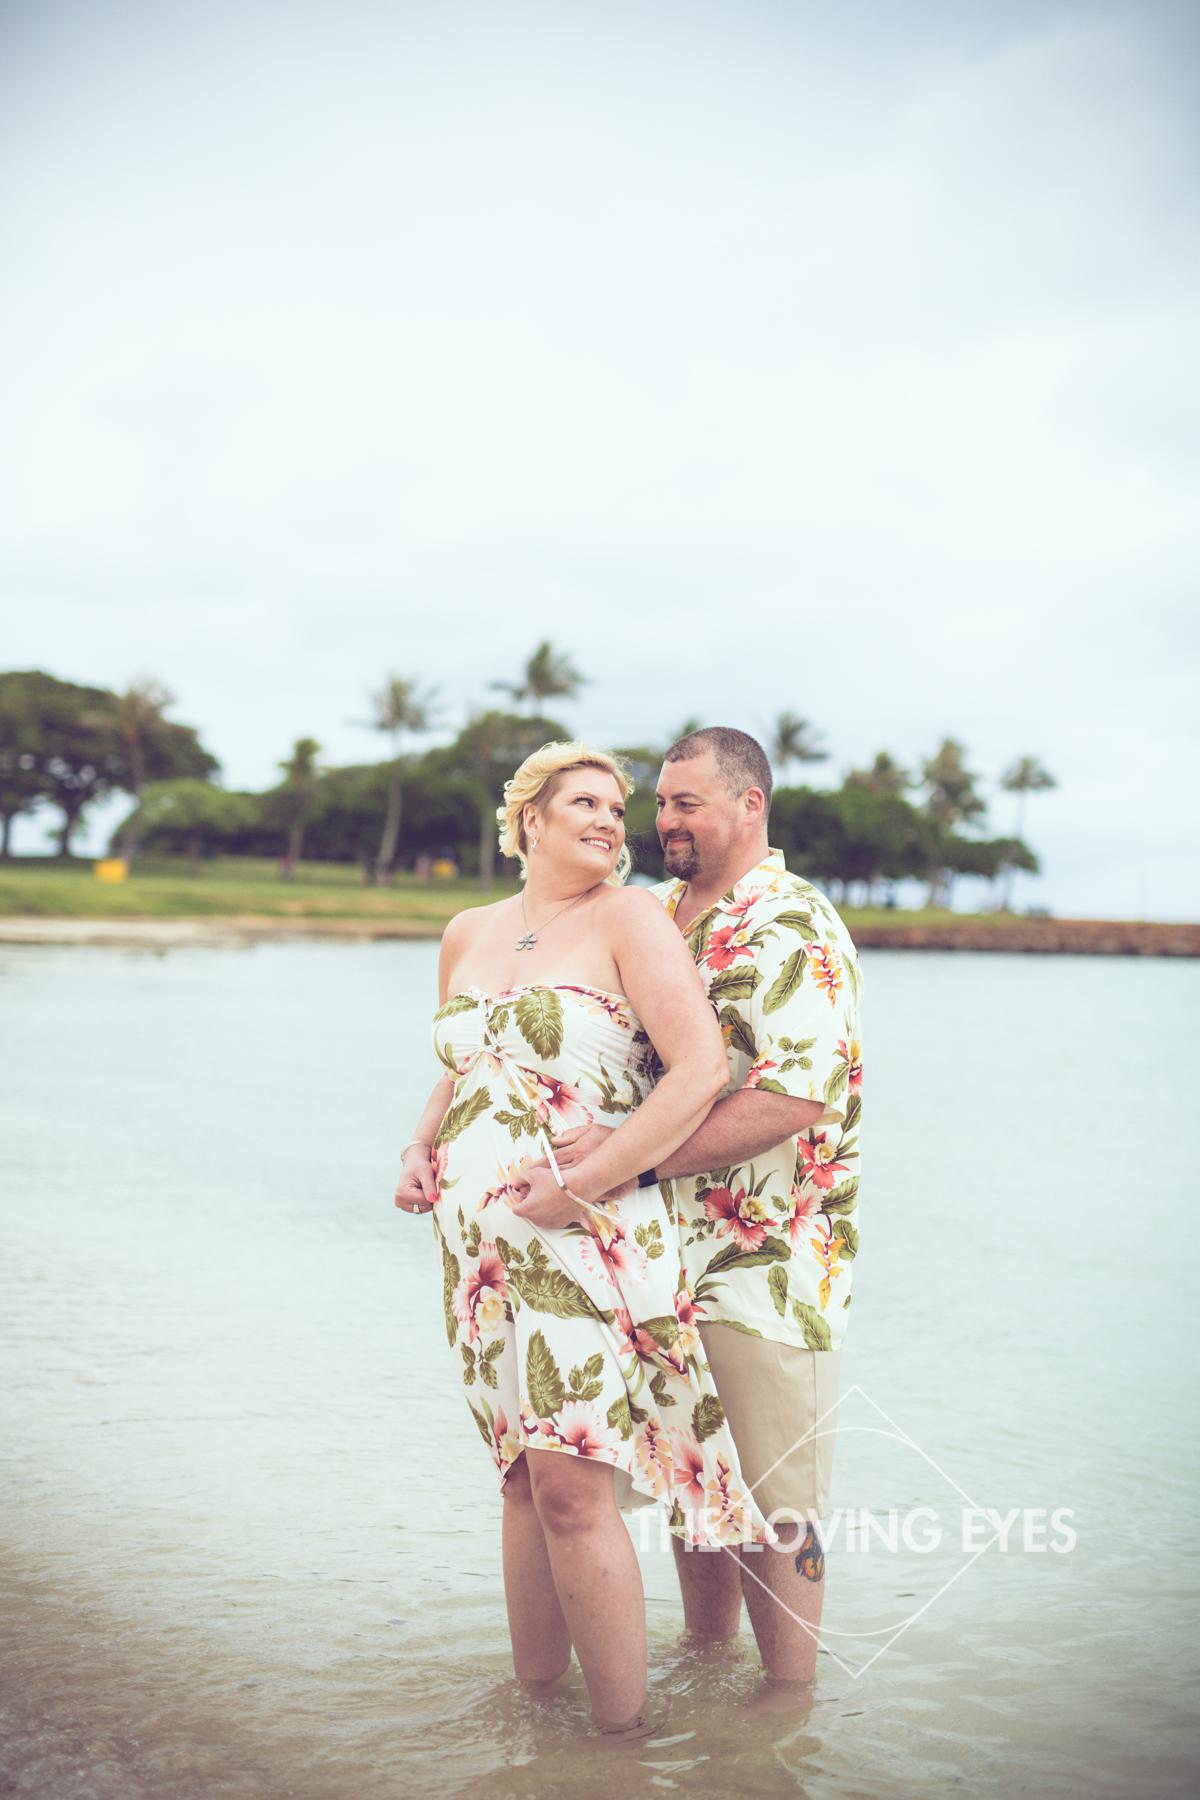 Having fun together on the beach during Hawaii vacation at Ala Moana Beach Park